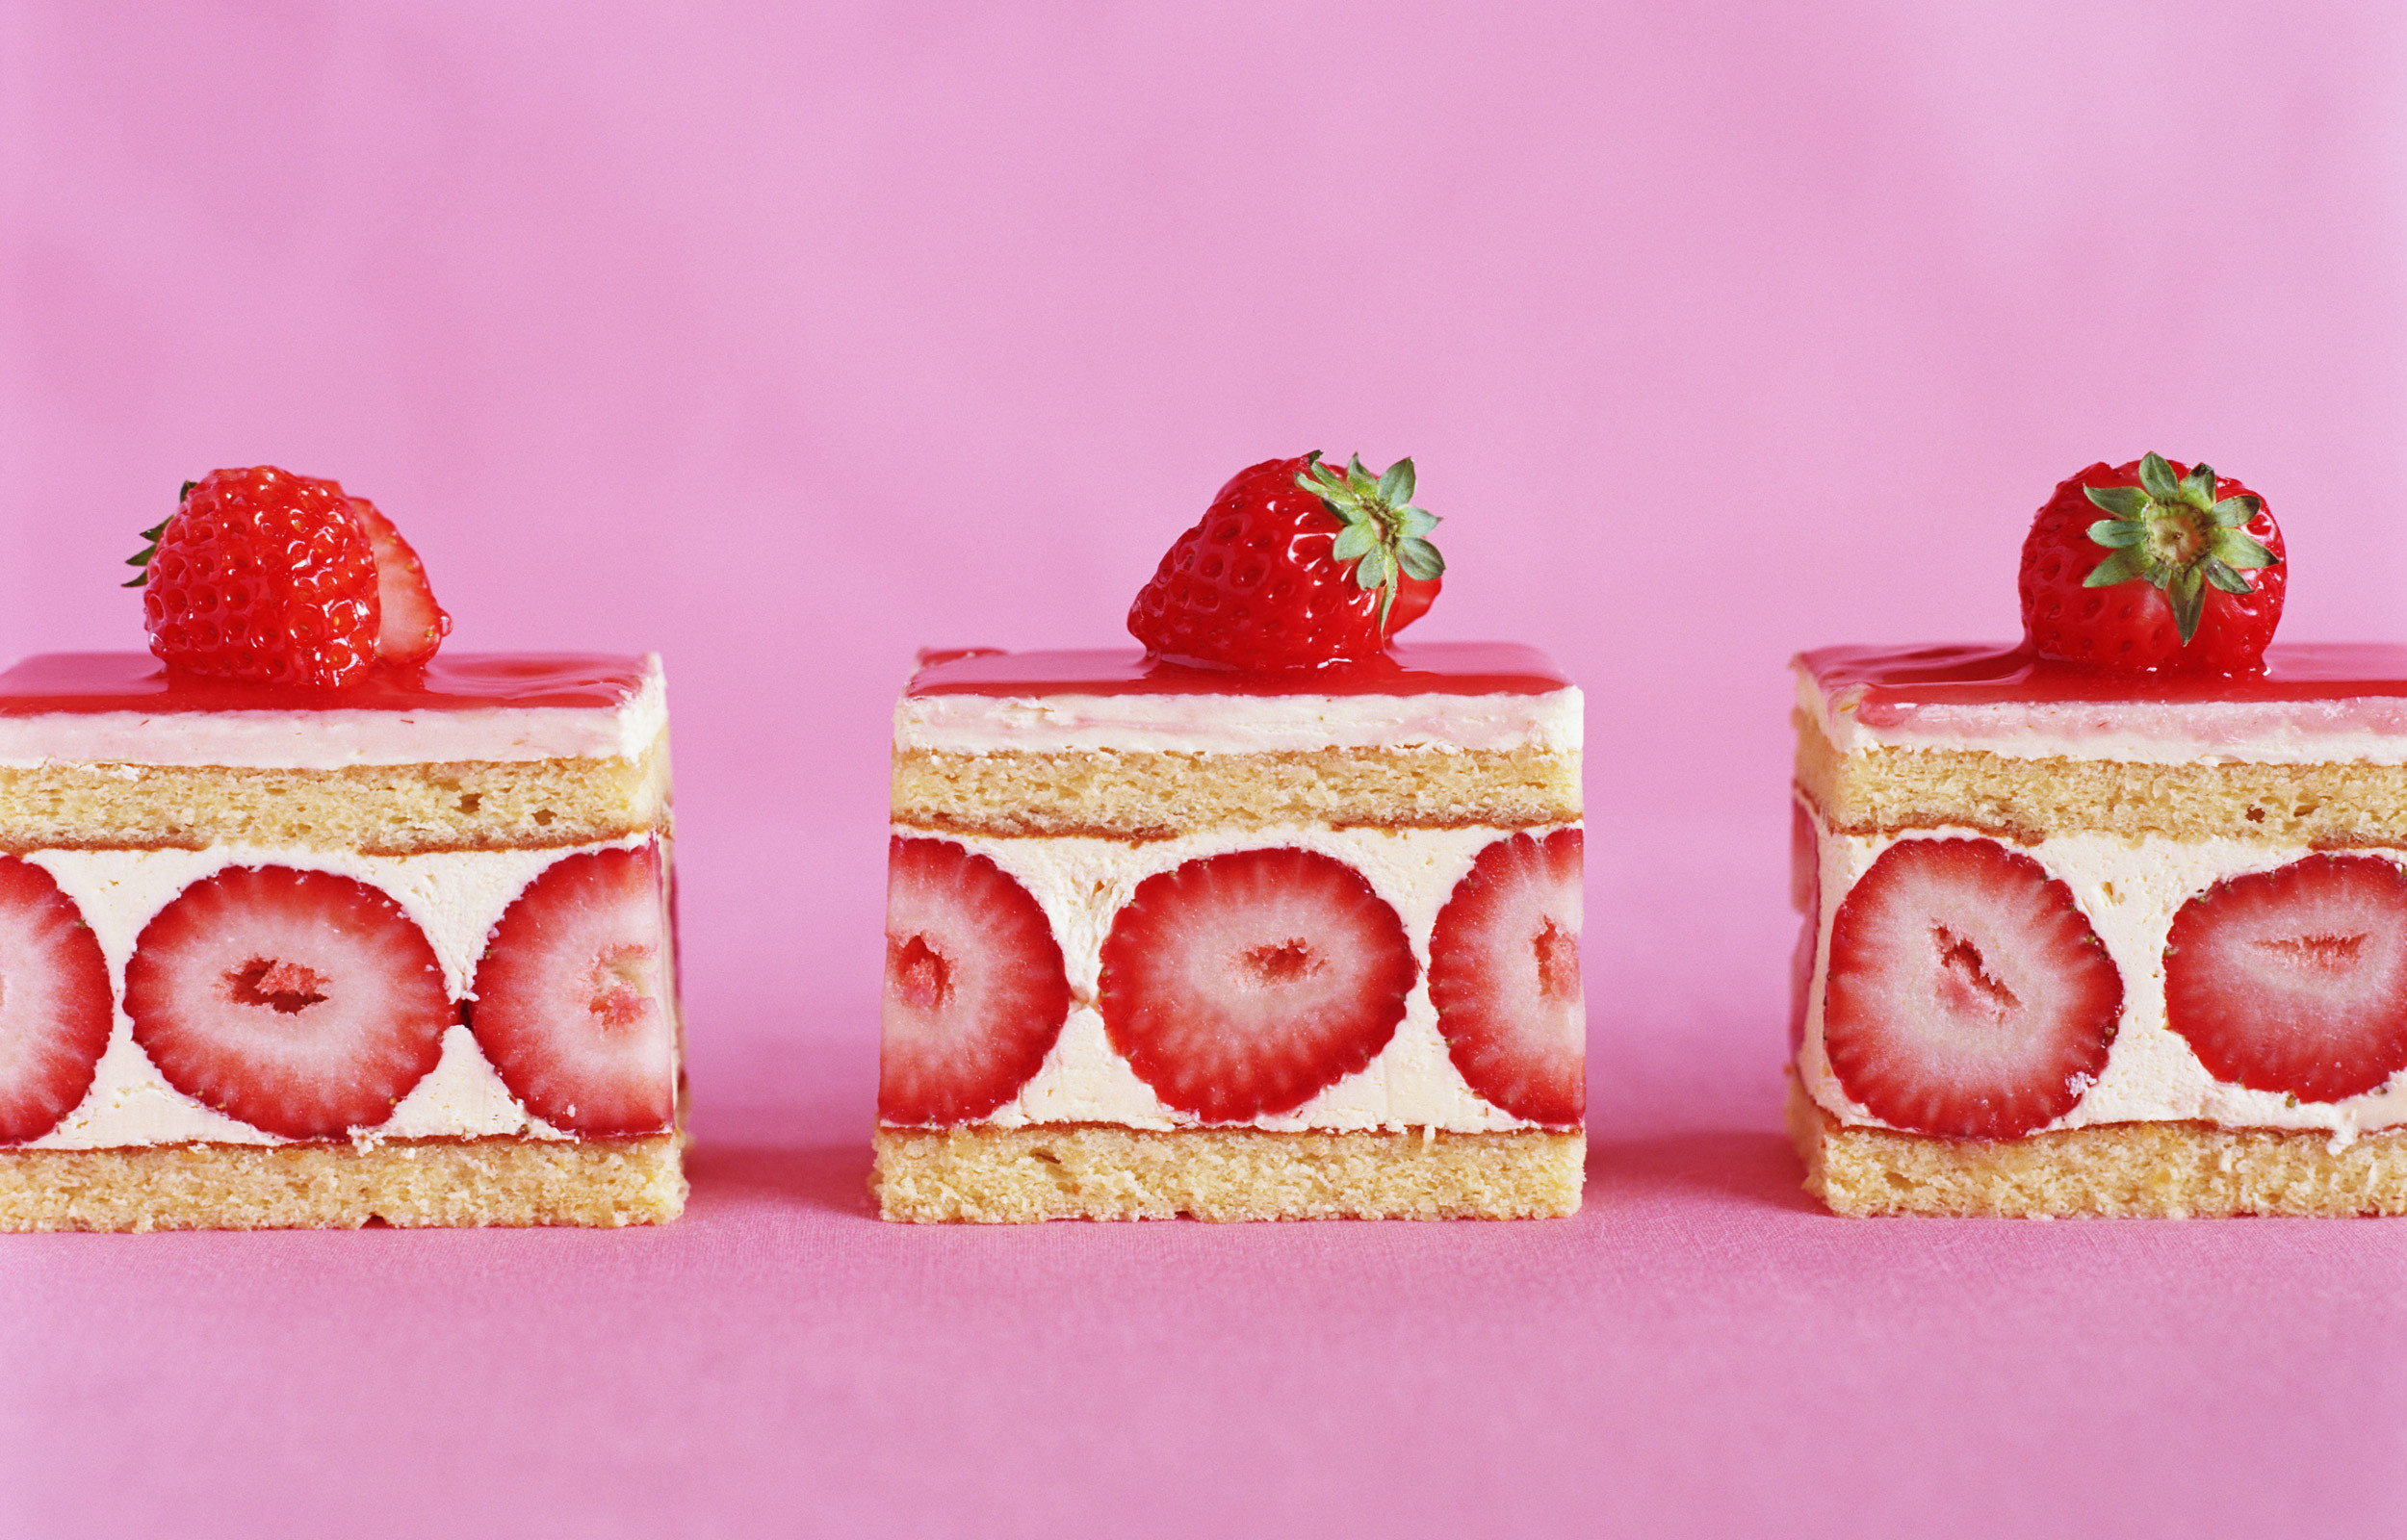 Cute Food Wallpaper